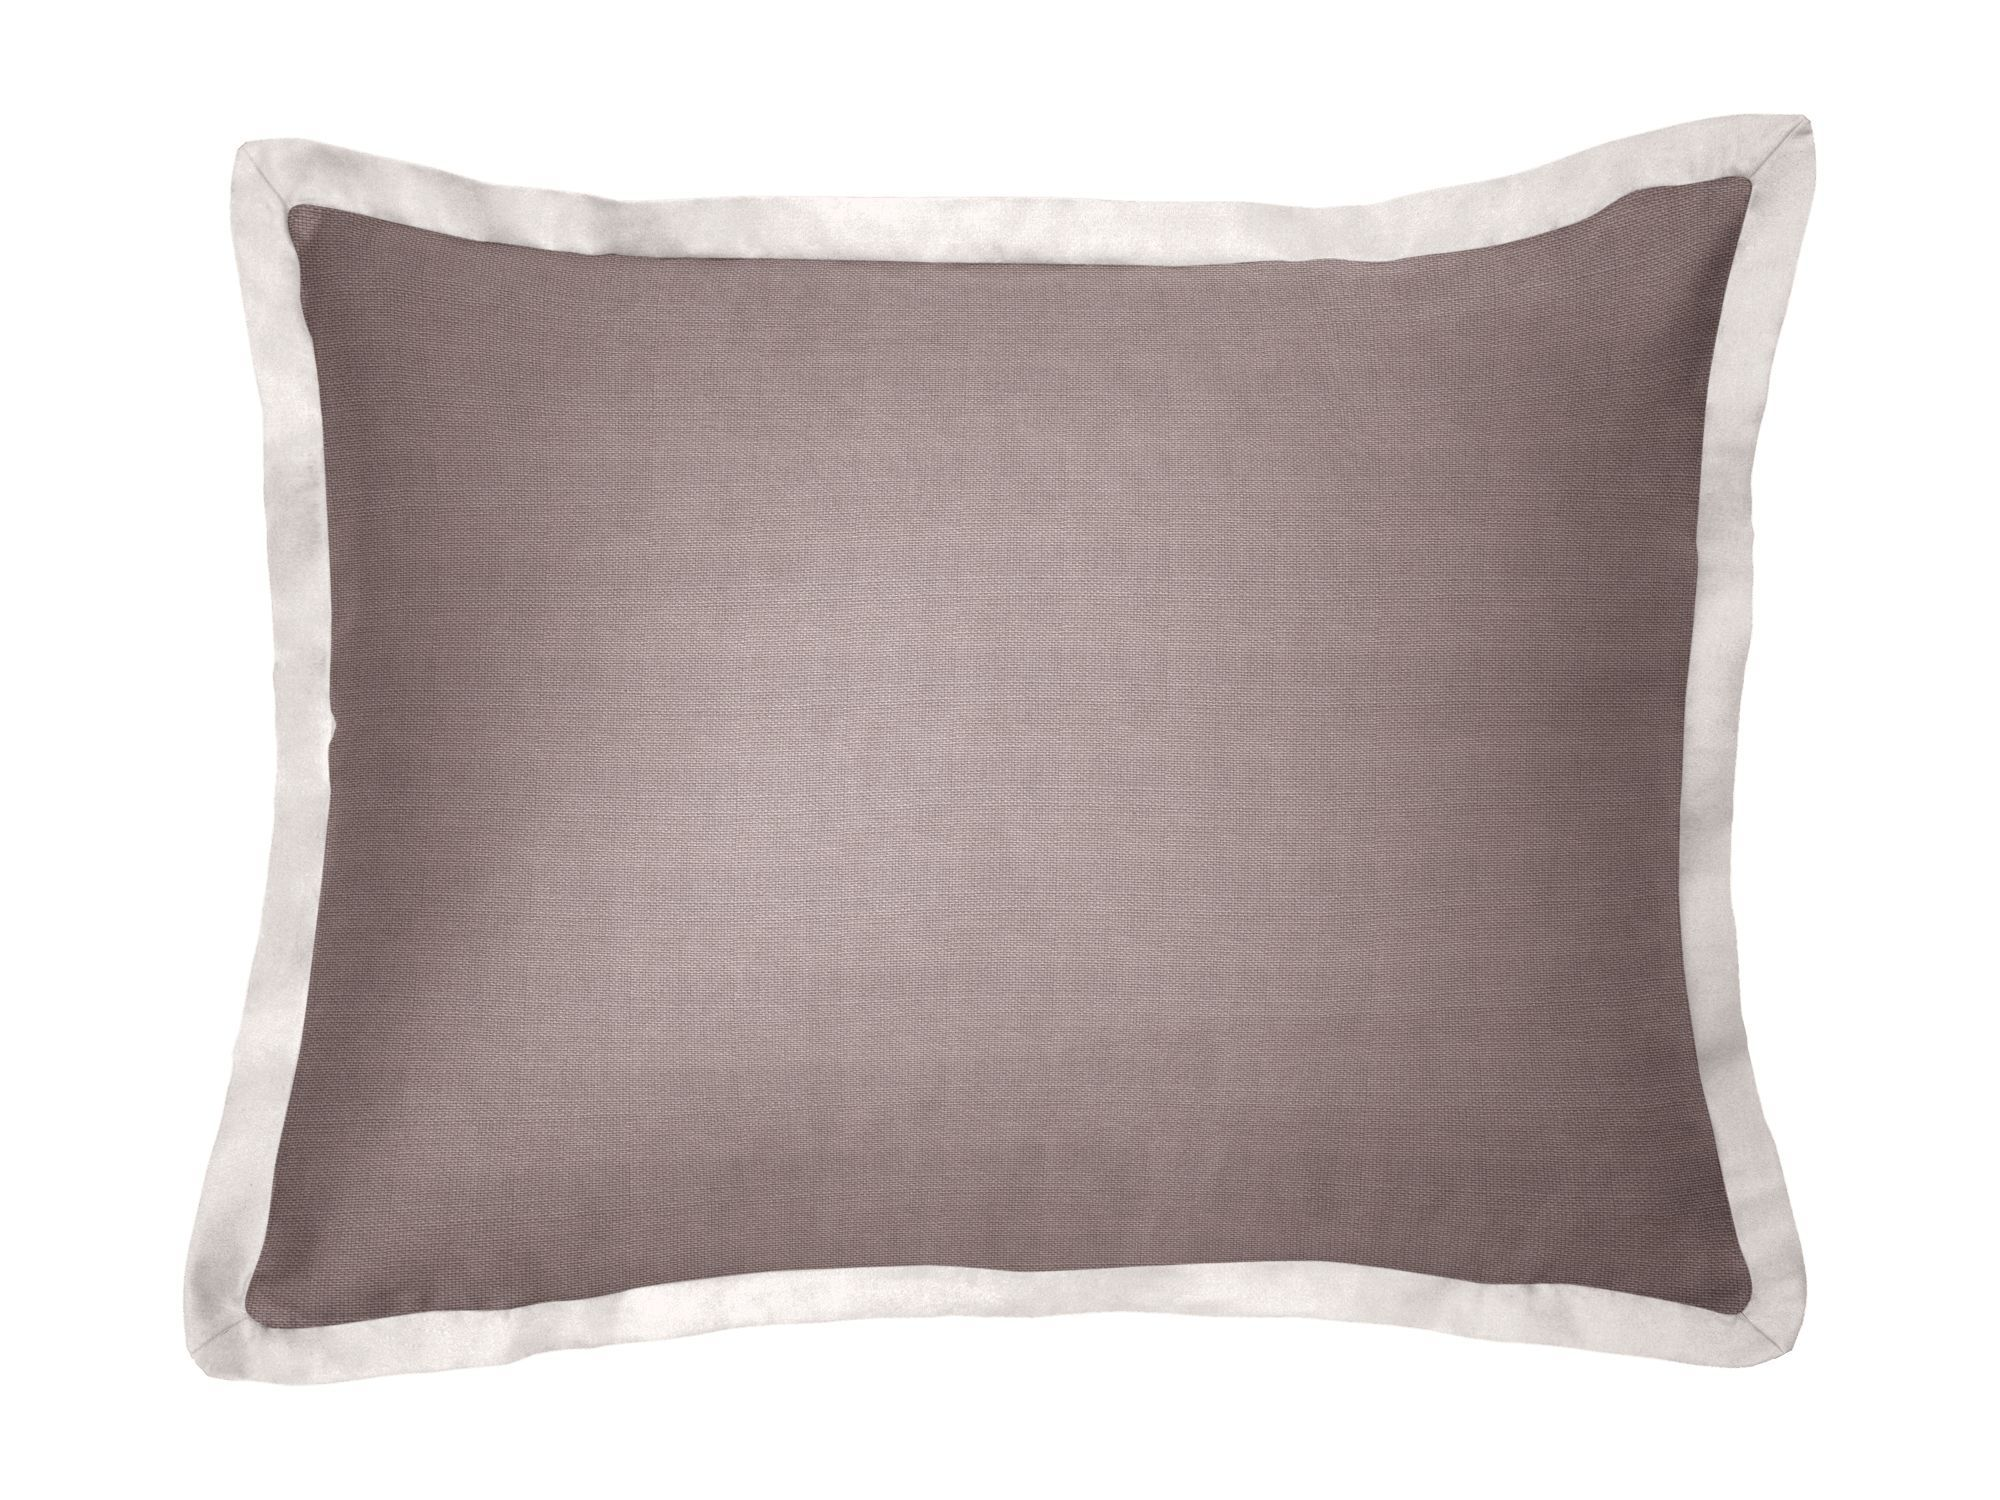 Custom Pillow Sham with Contrast Flange | Loom Decor | Loom Decor